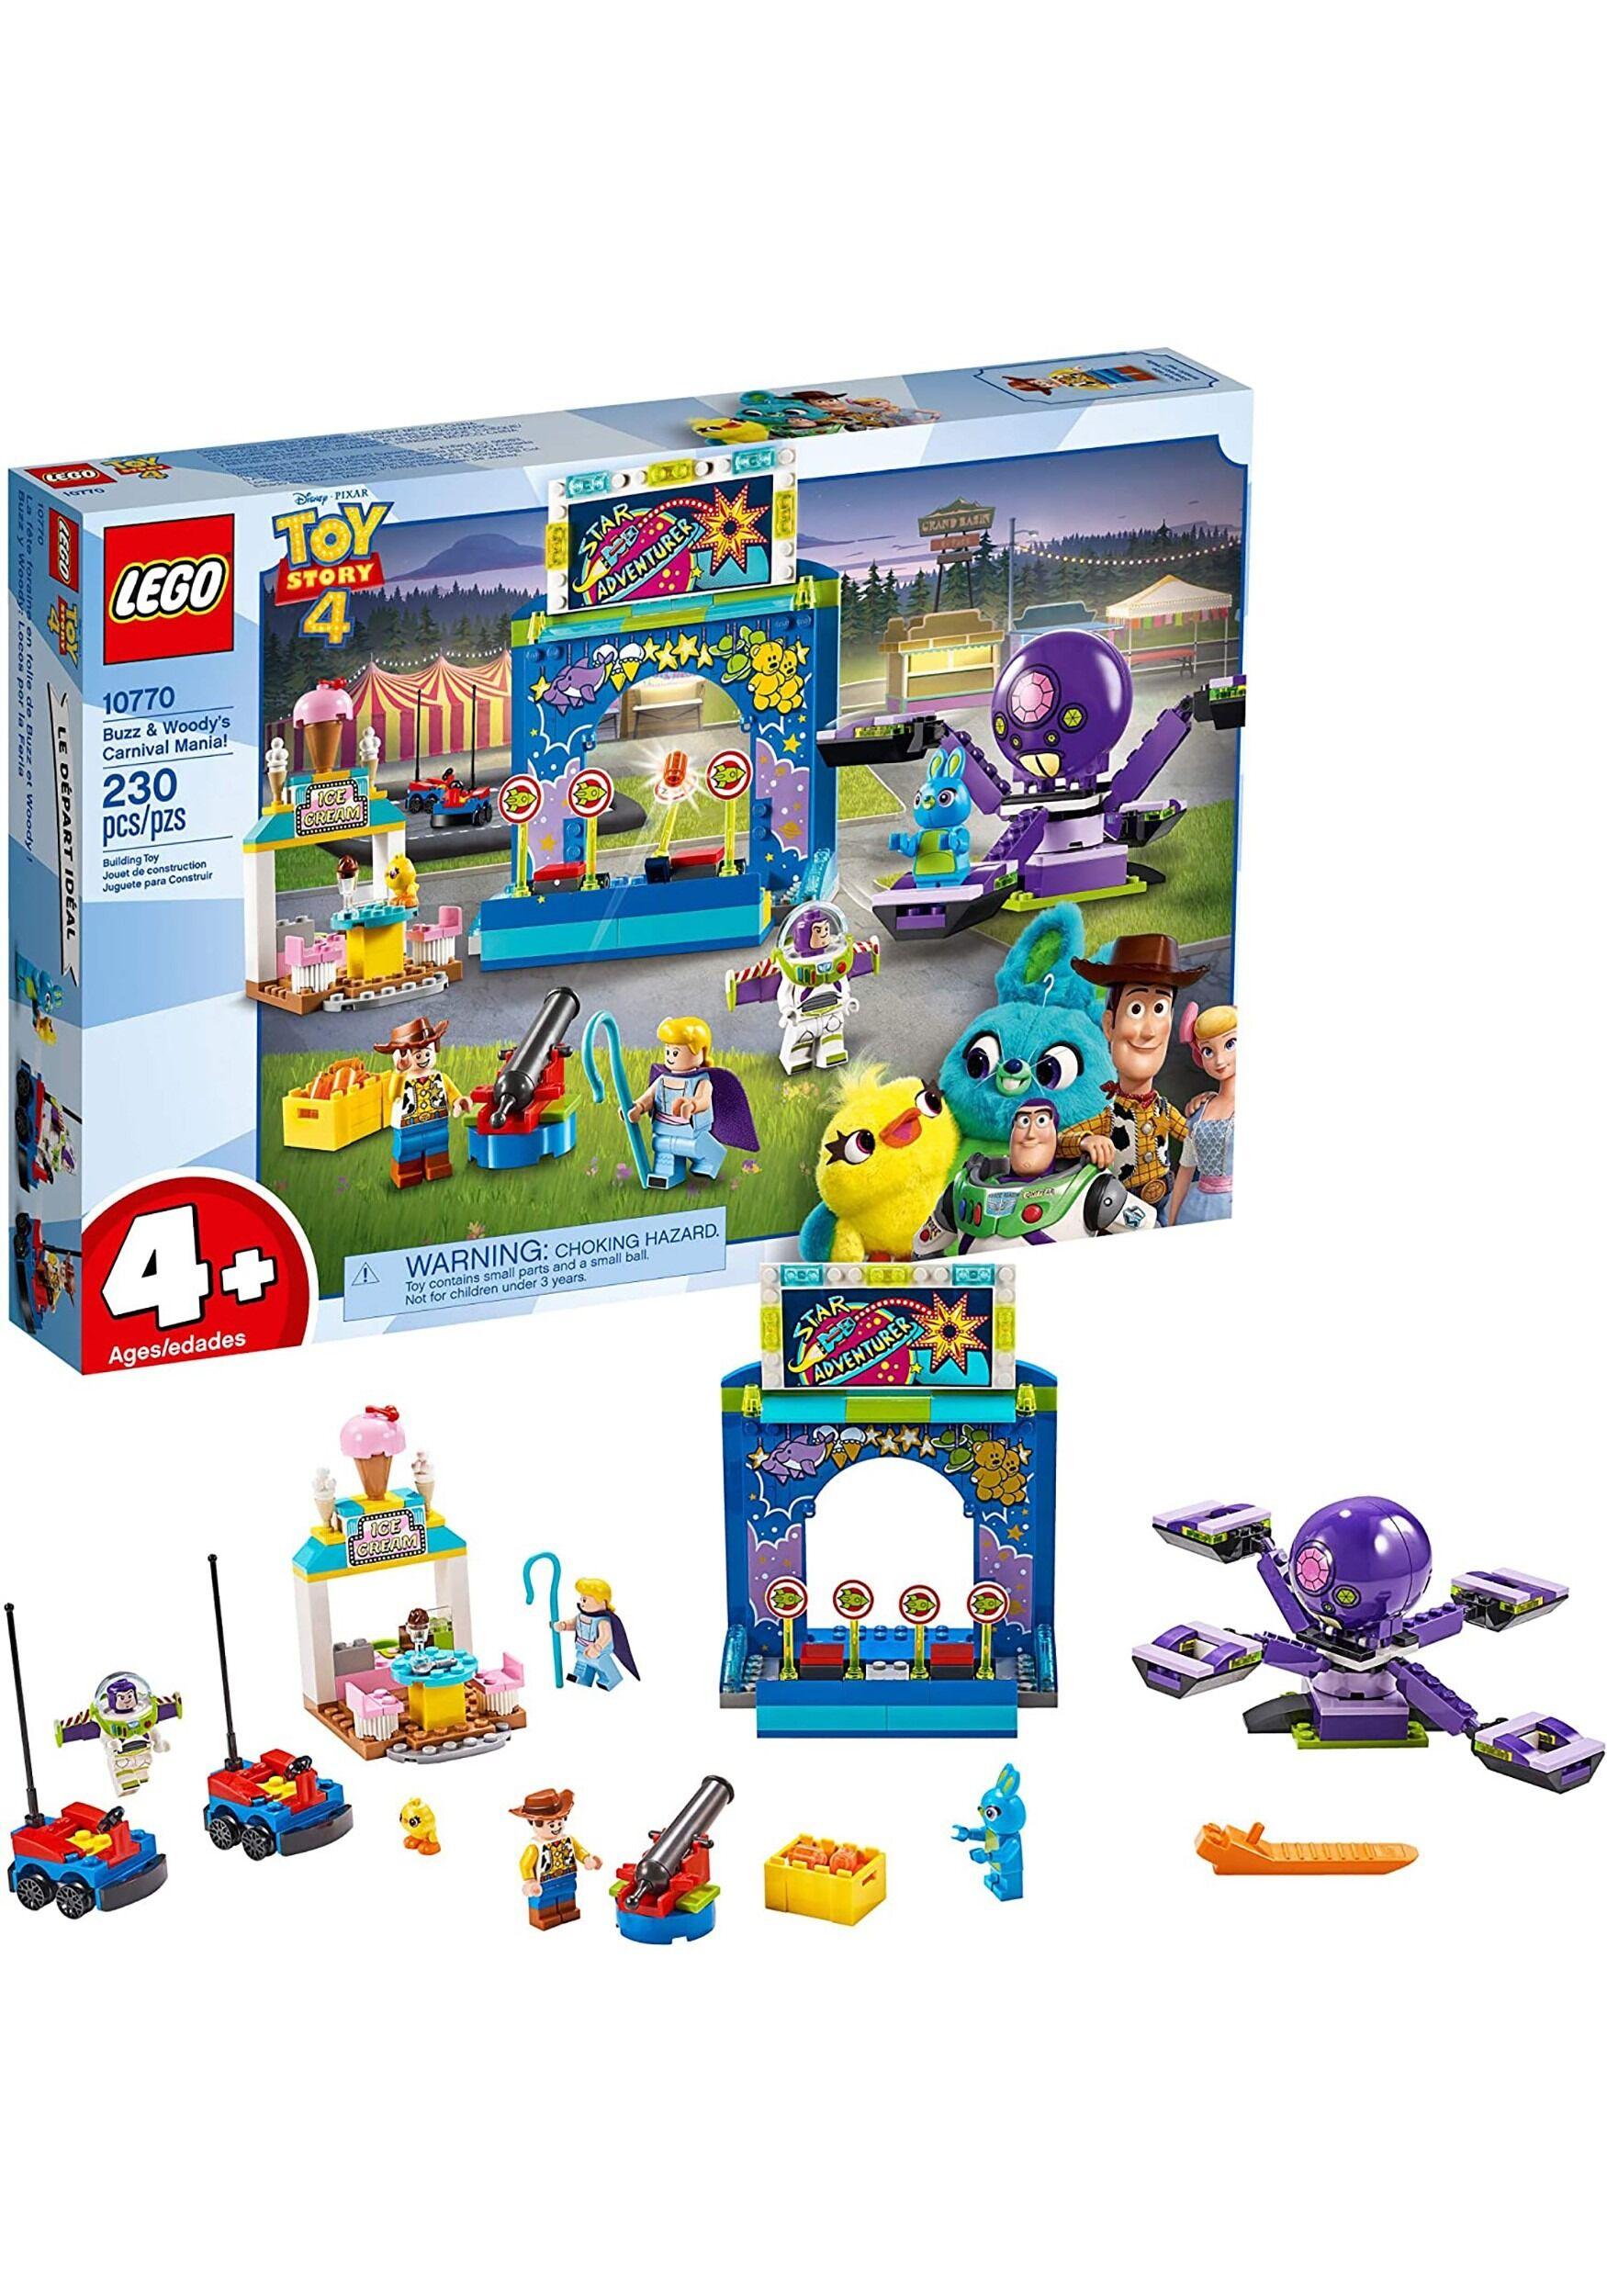 Lego Toy Story 4 Buzz & Woody's Carnival Mania! Building Block Set  - Blue/Orange/Purple - Size: One